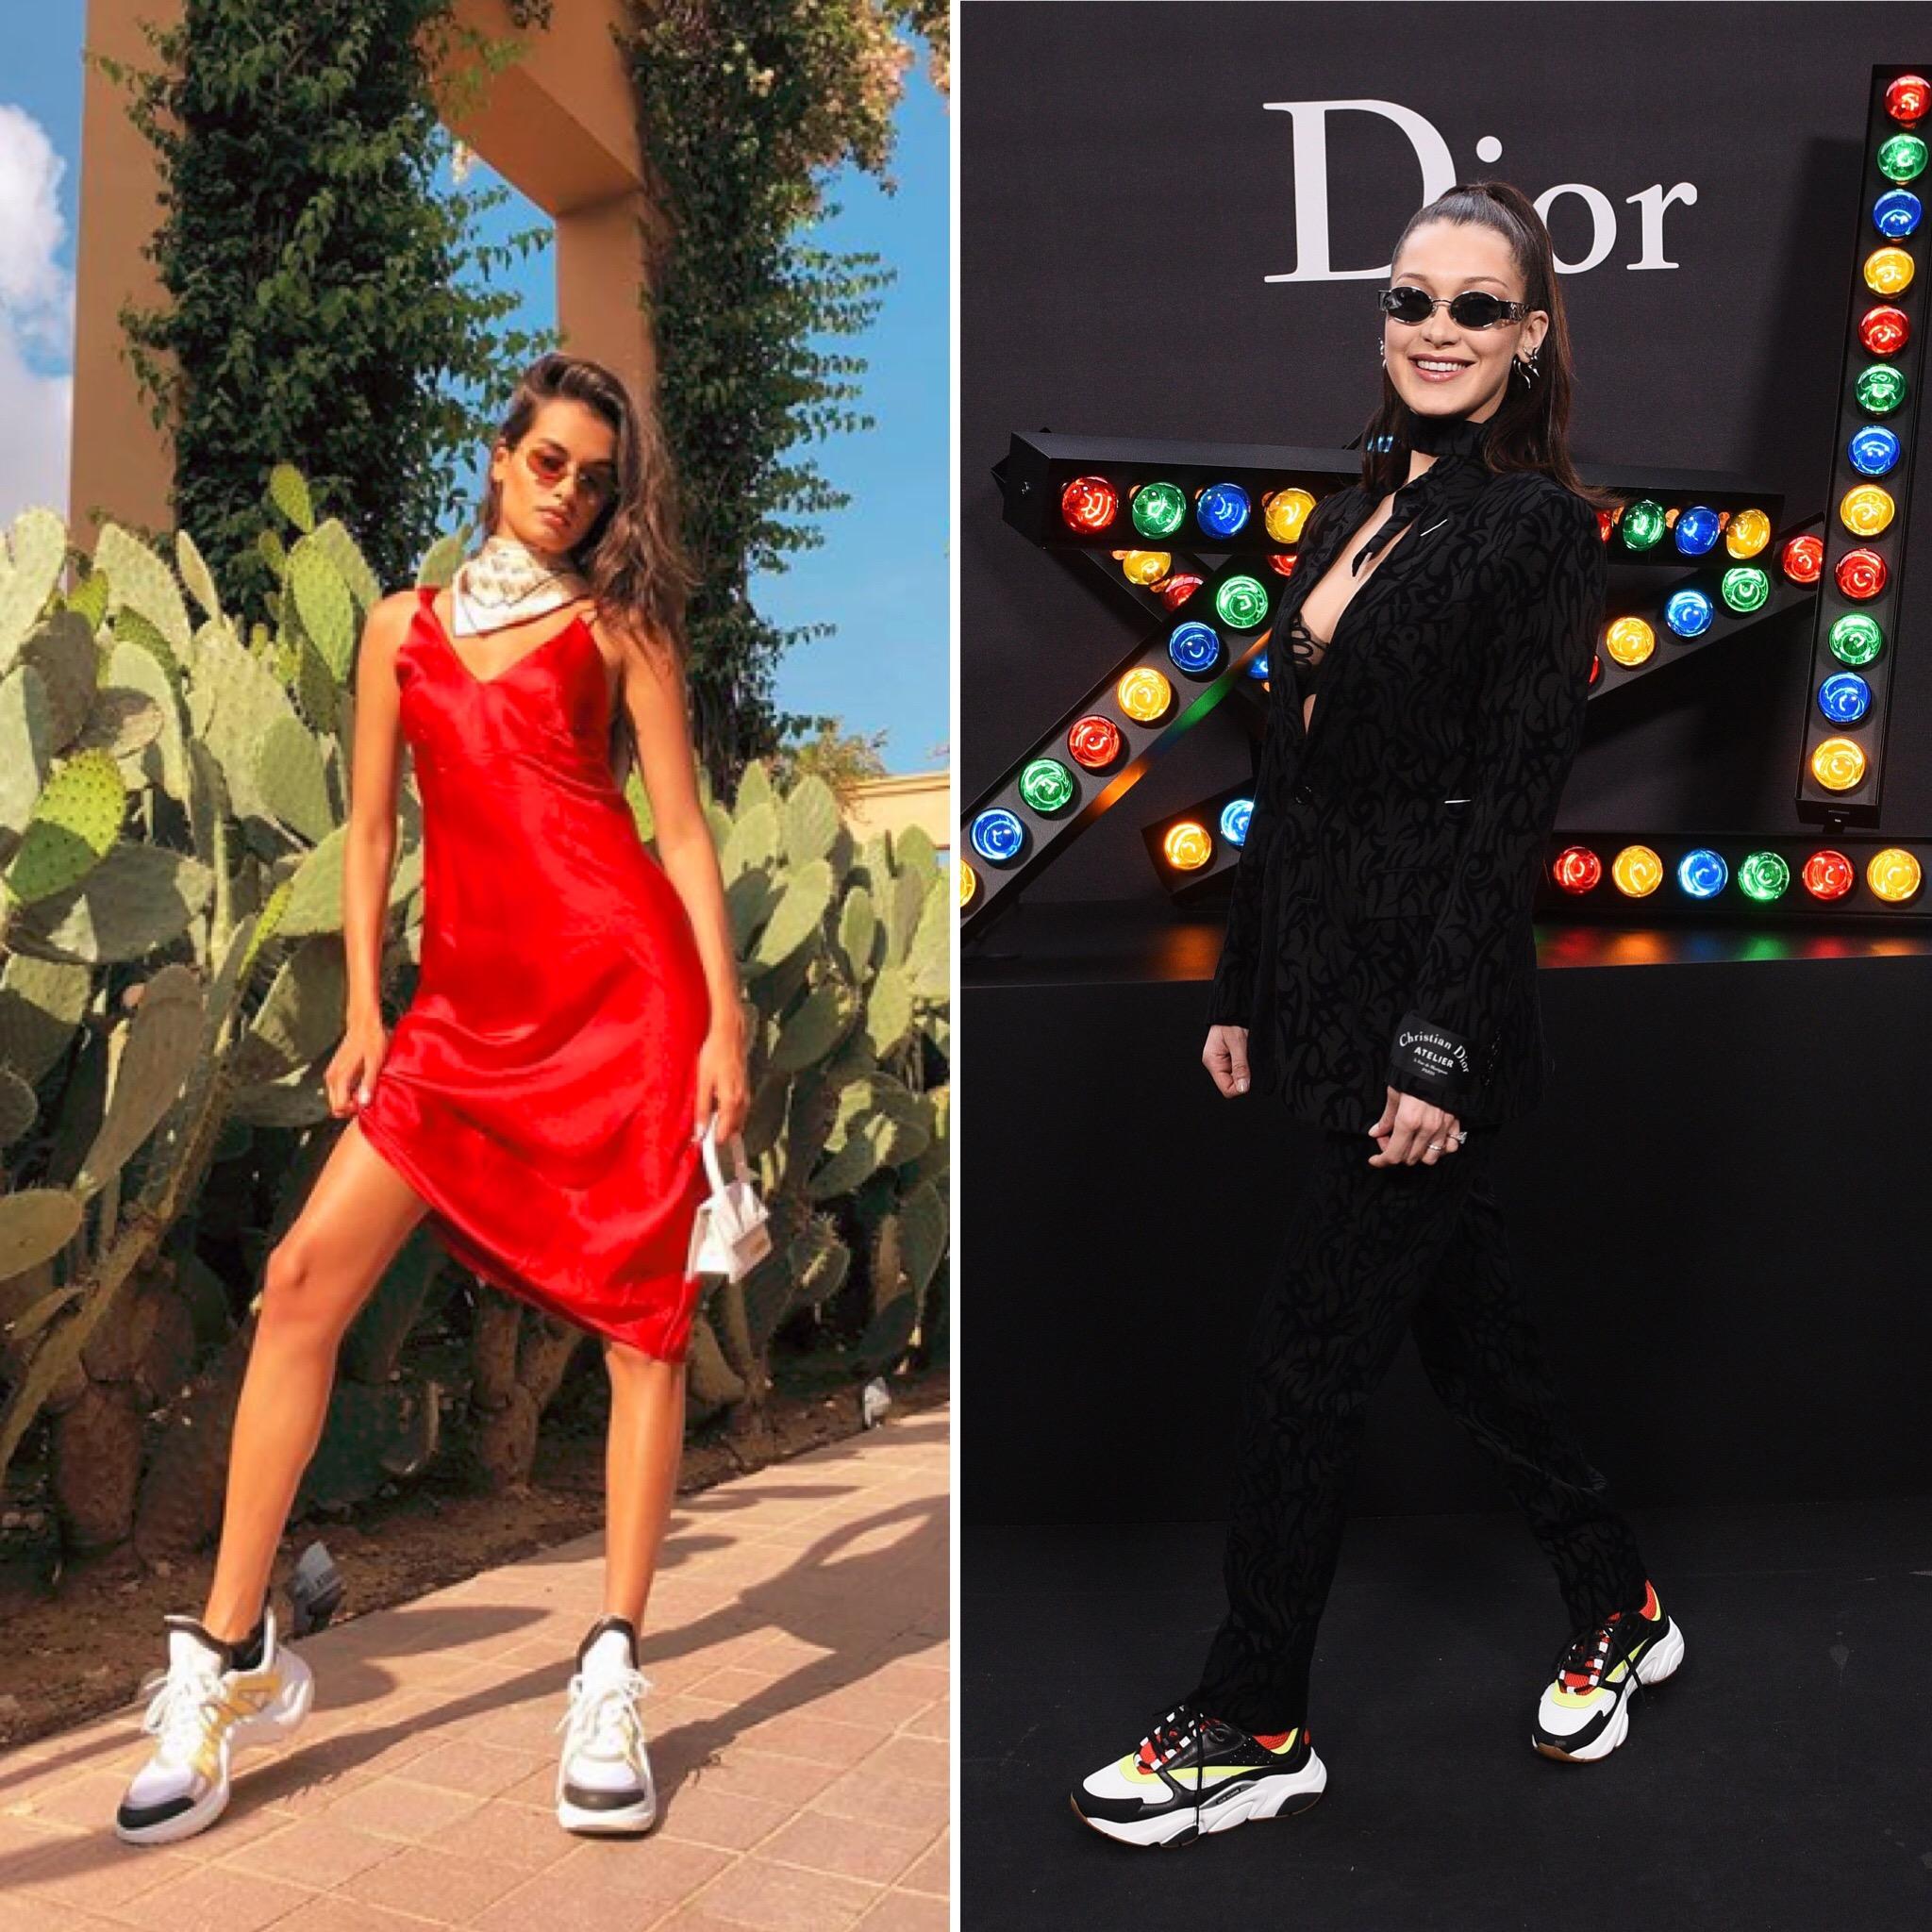 dad-sneaker-bella-hadid-gizele-oliveira